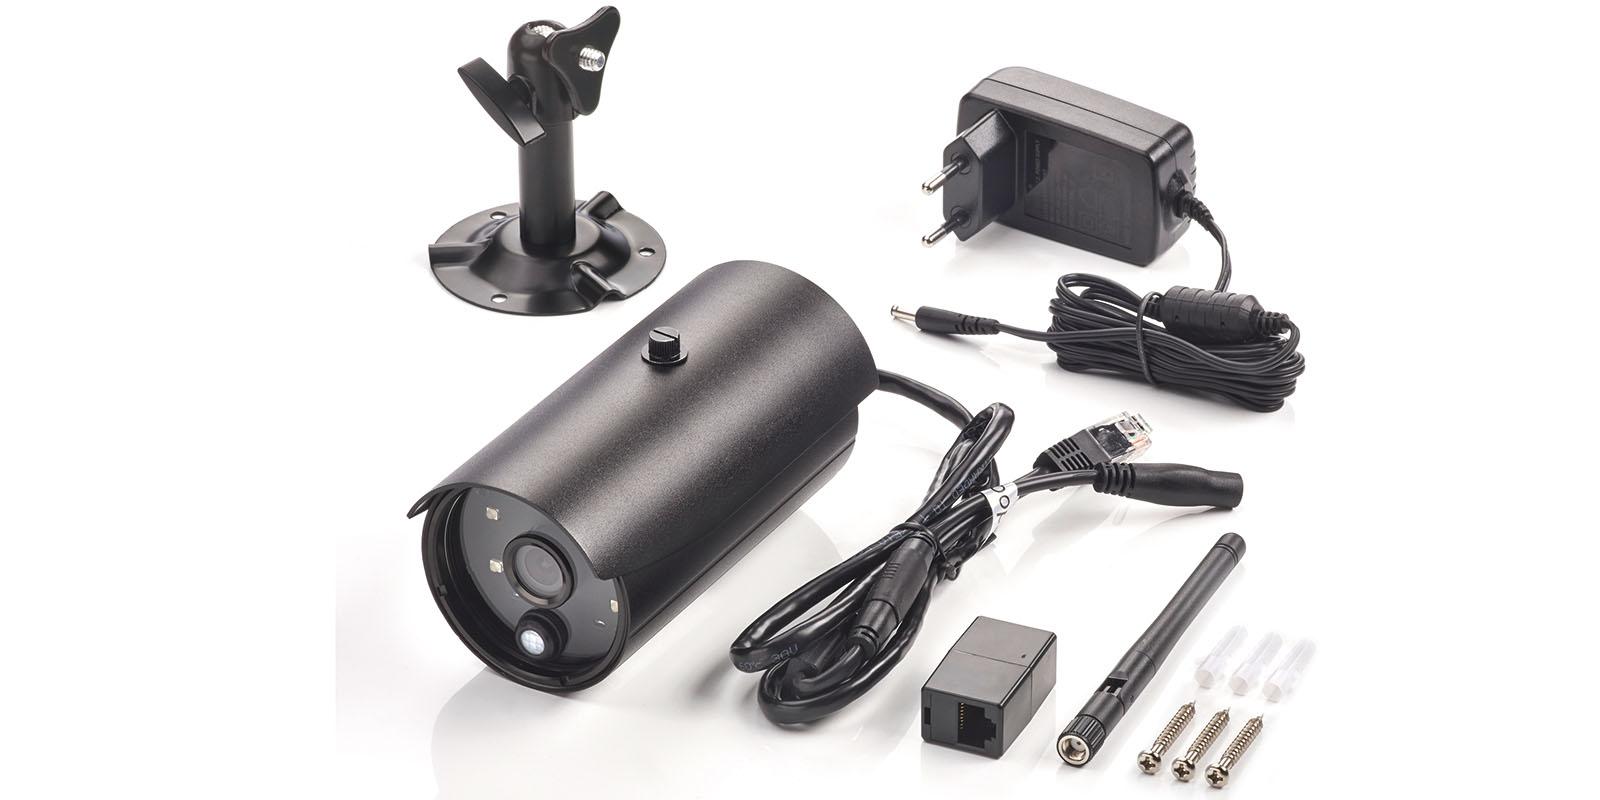 ip berwachungskamera wlan au enbereich kamera berwachung. Black Bedroom Furniture Sets. Home Design Ideas